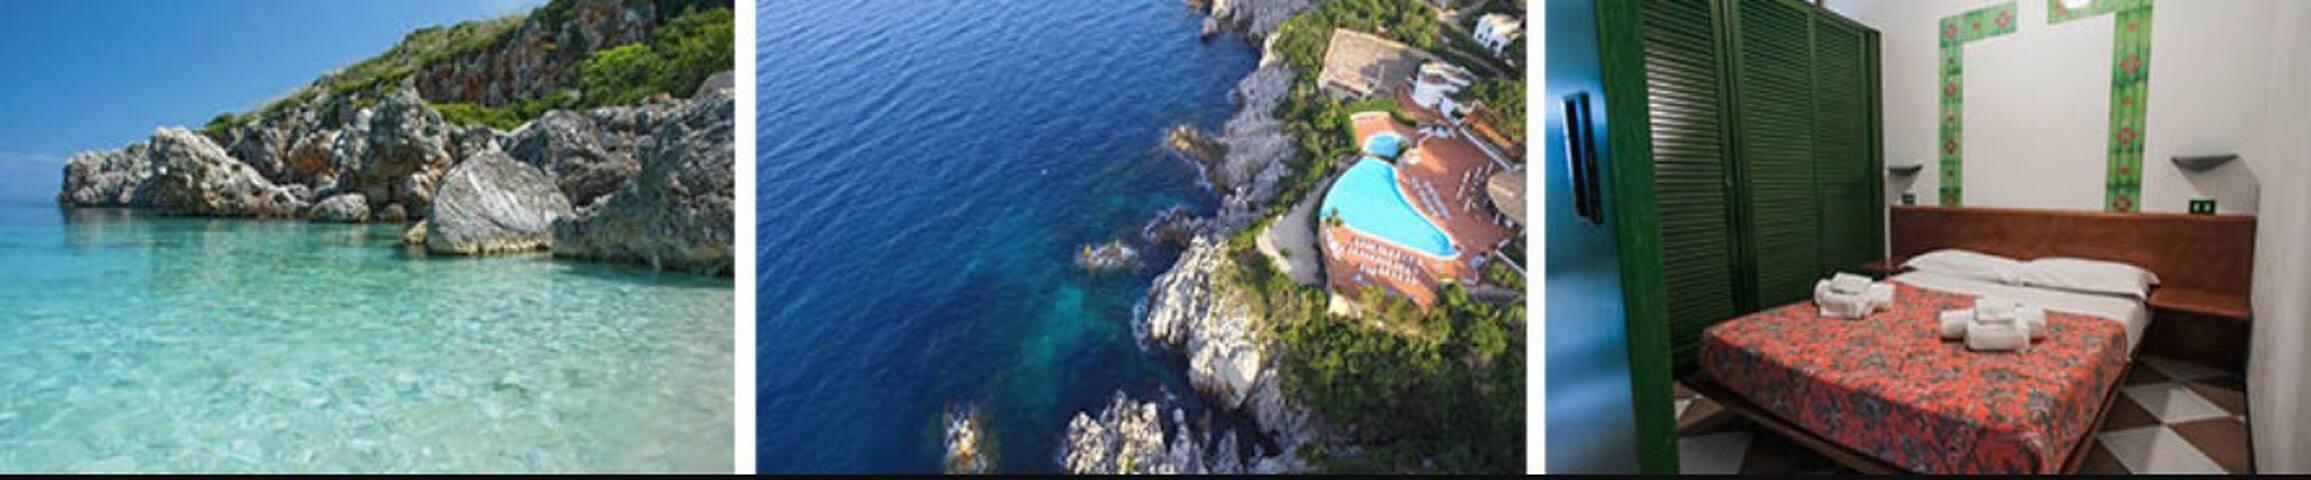 San Vito lo capo -calampiso resort - Сан-Вито Ло Капо - Квартира